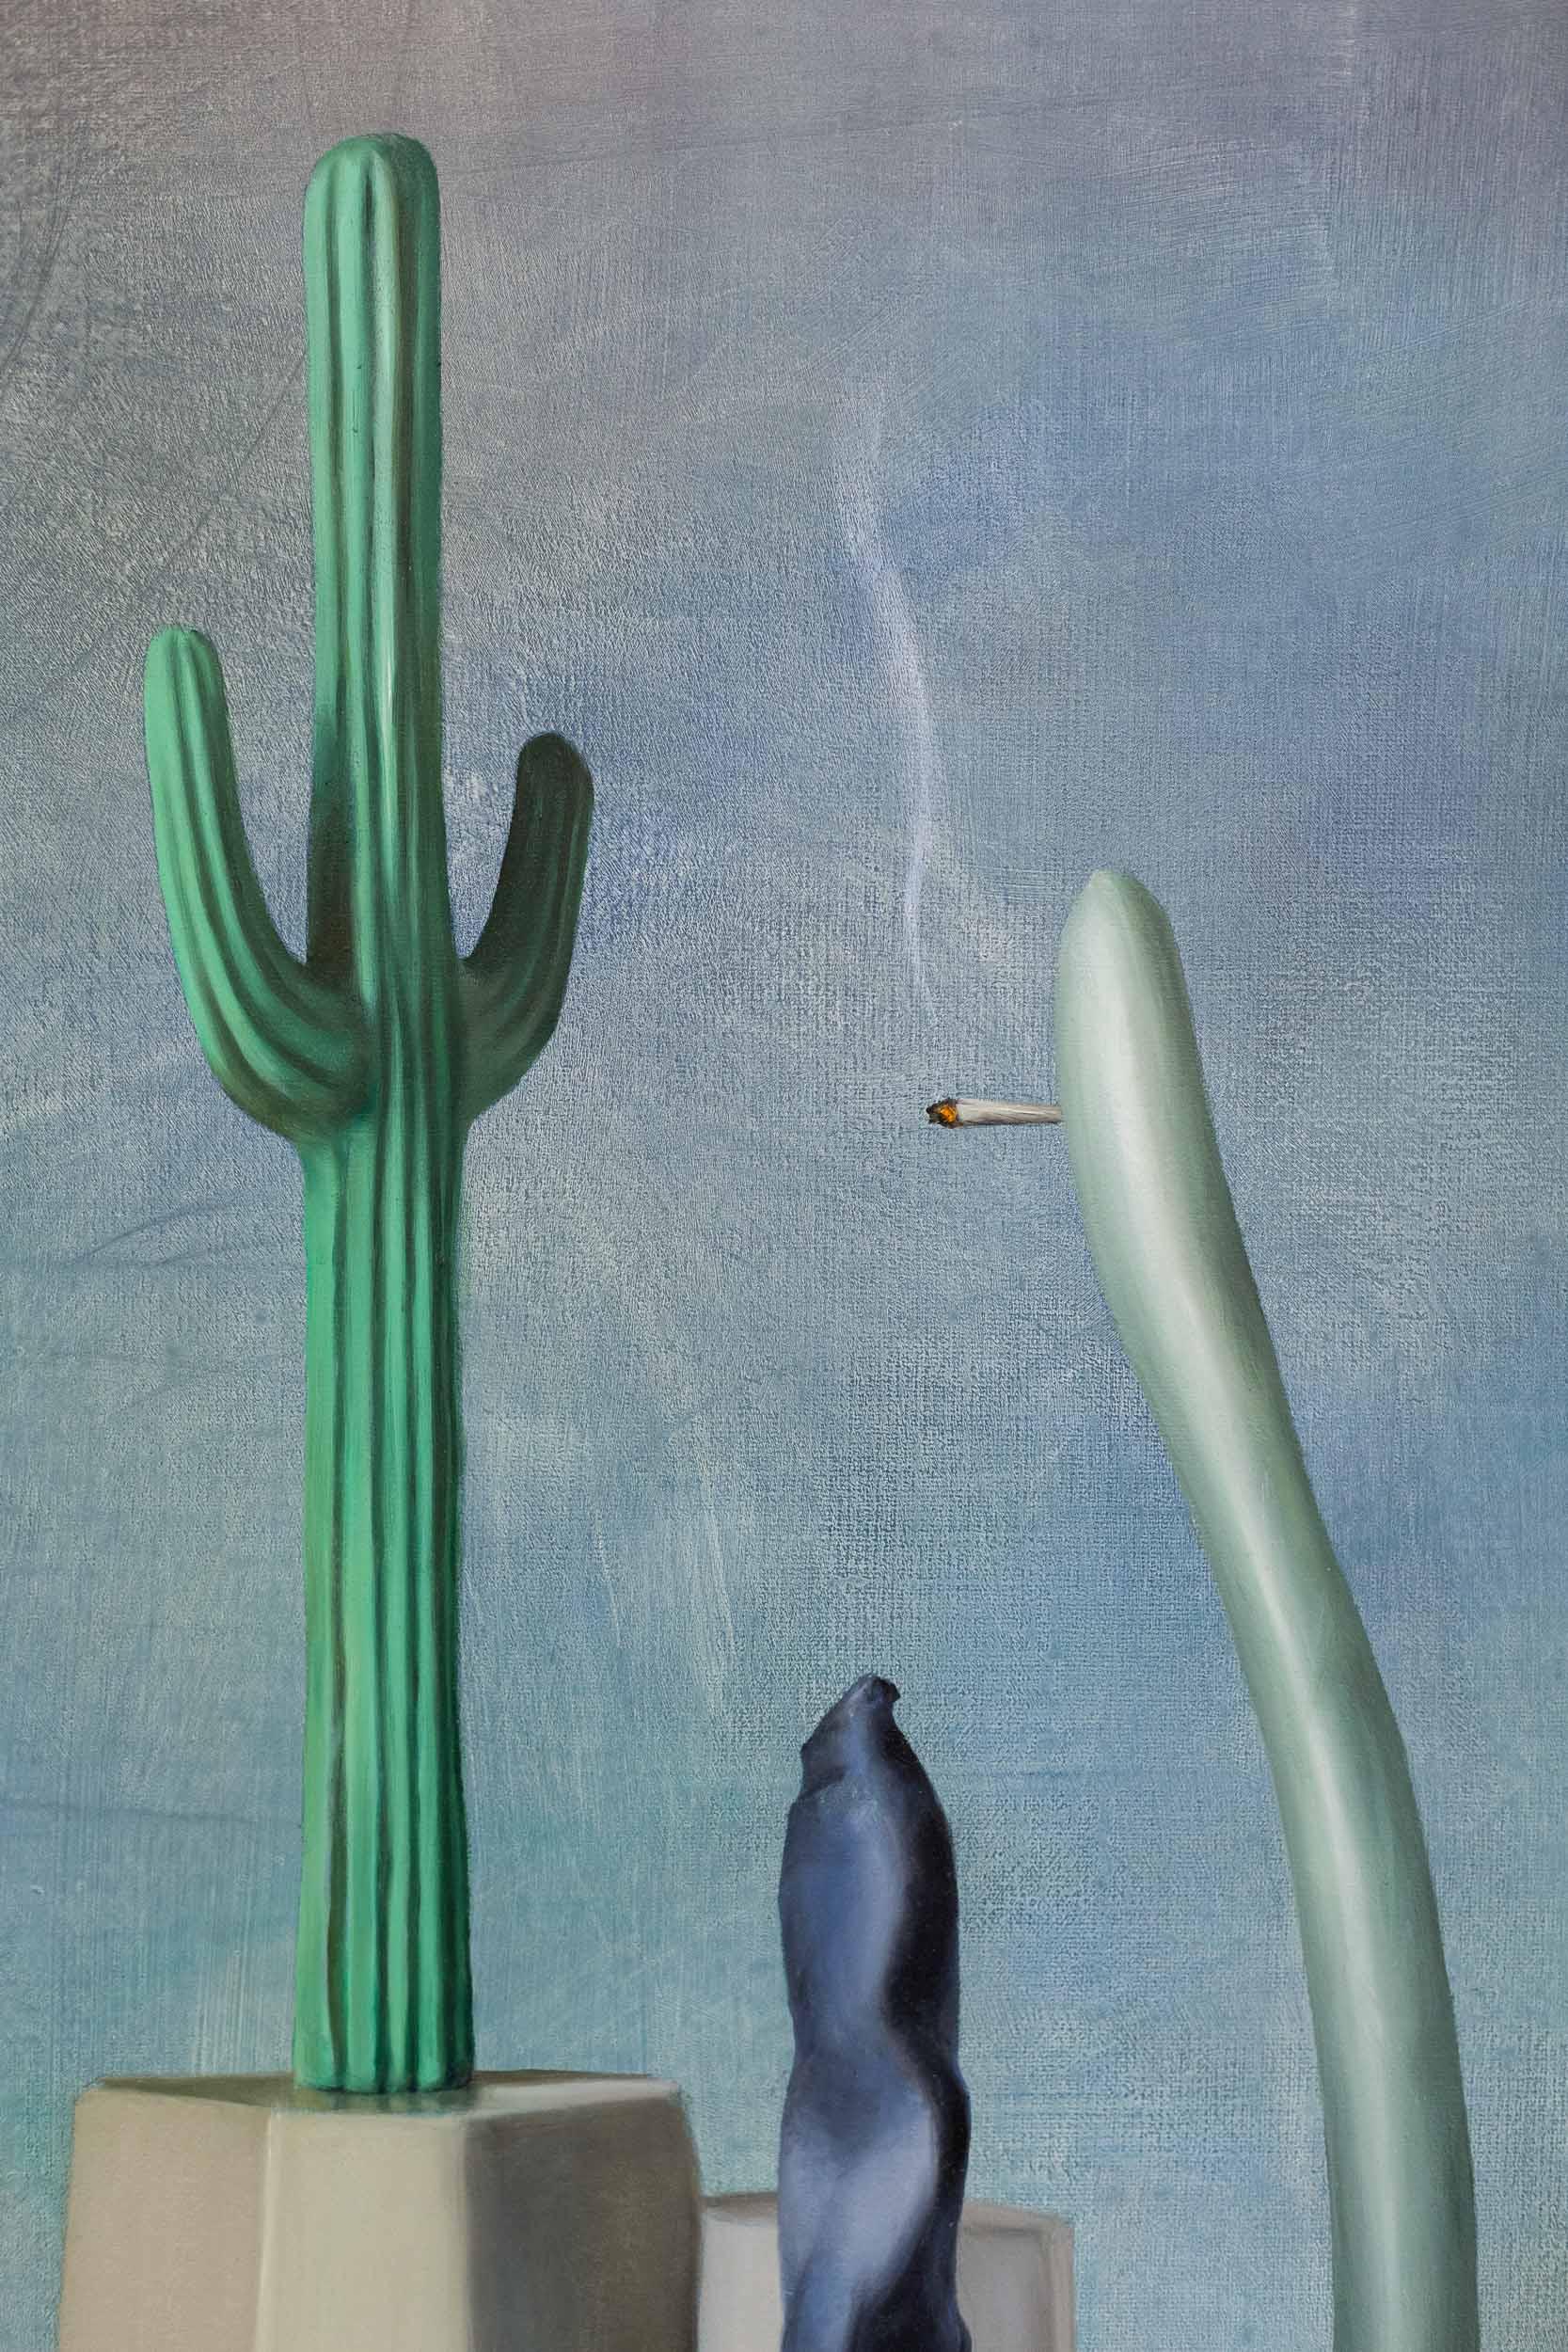 Francisco Sierra,  De Excursie  (detail), 2016, oil on canvas, 80 x 60 cm  Photo: Kilian Bannwart